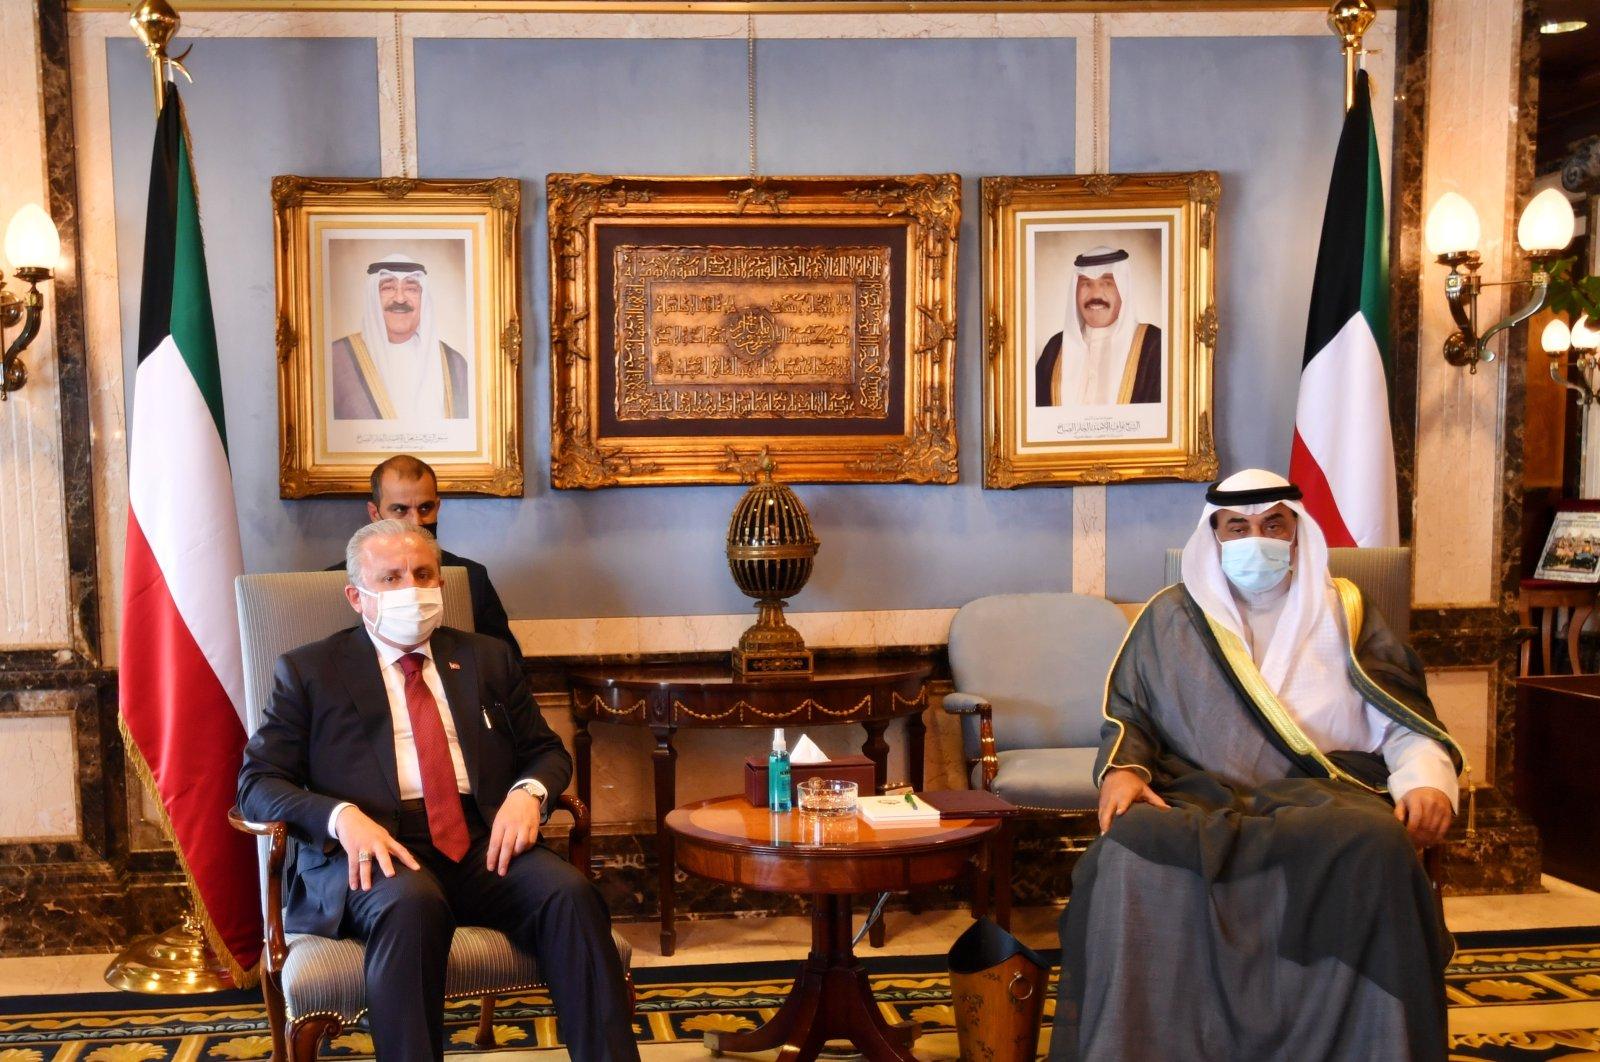 Turkish Parliament Speaker Mustafa Şentop (L) meets with Kuwaiti Prime Minister Sabah Al-Khalid Al-Sabah at Bayan Palace, Kuwait, July 12, 2021. (AA Photo)